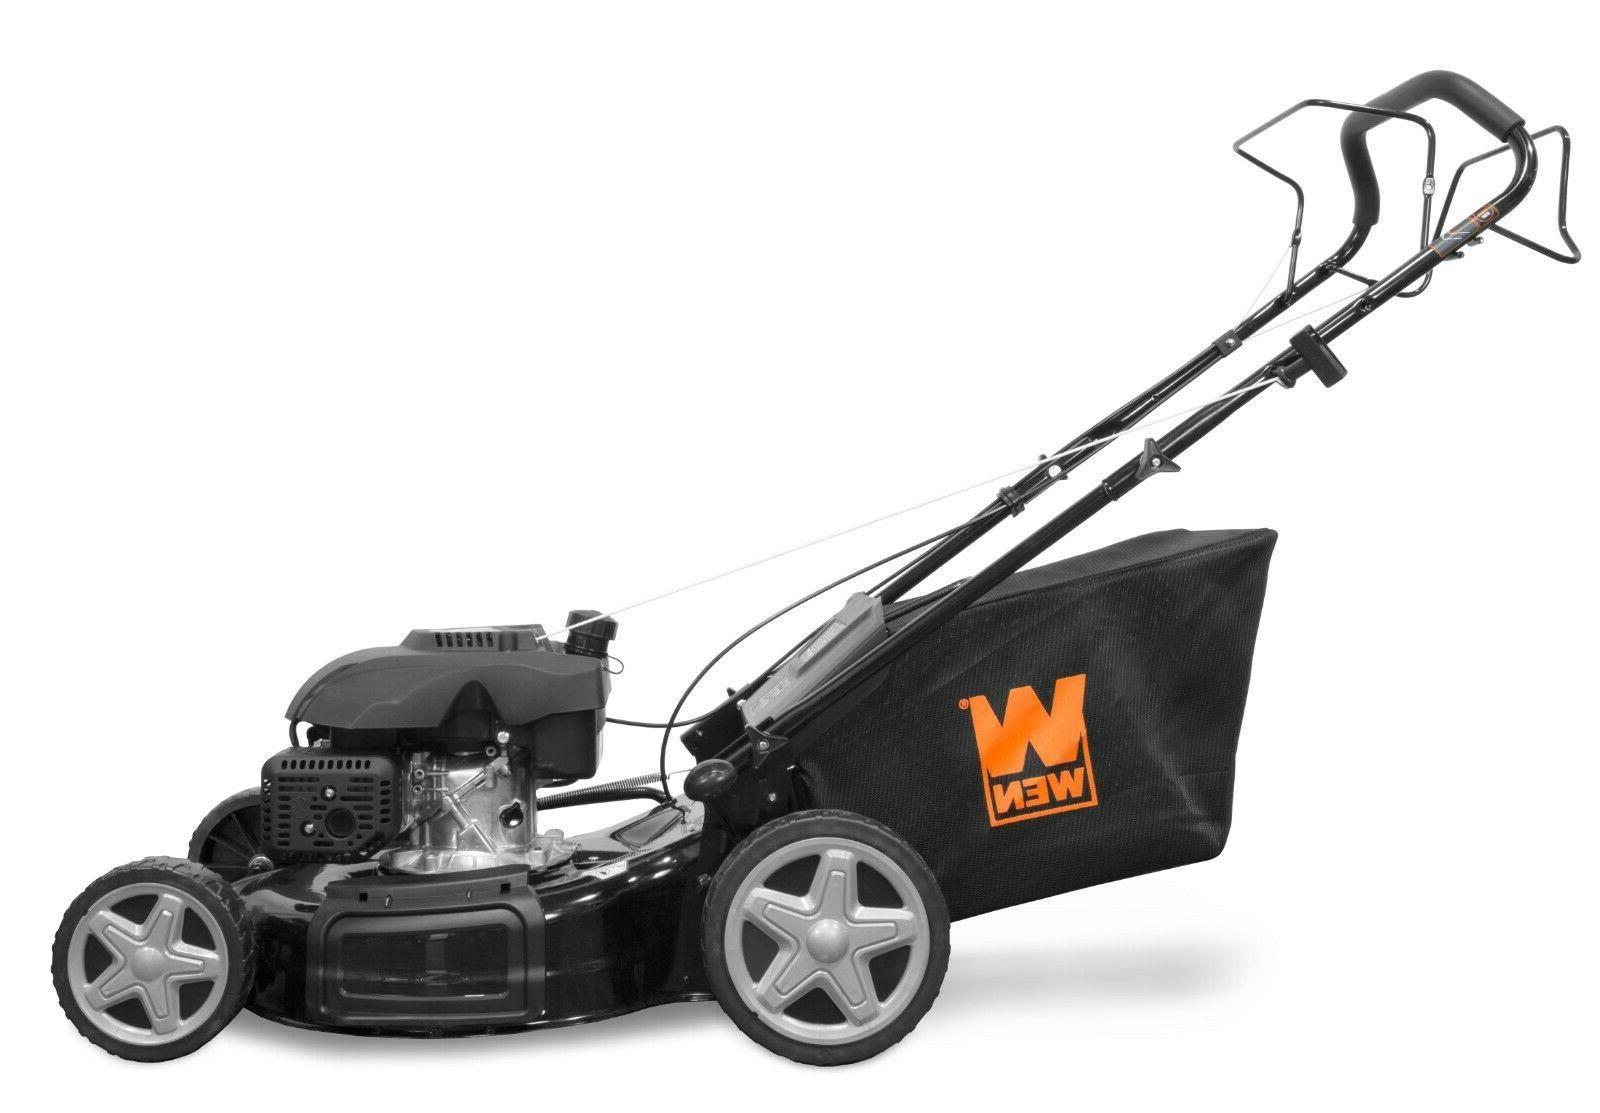 WEN Gas-Powered Self-Propelled Mower